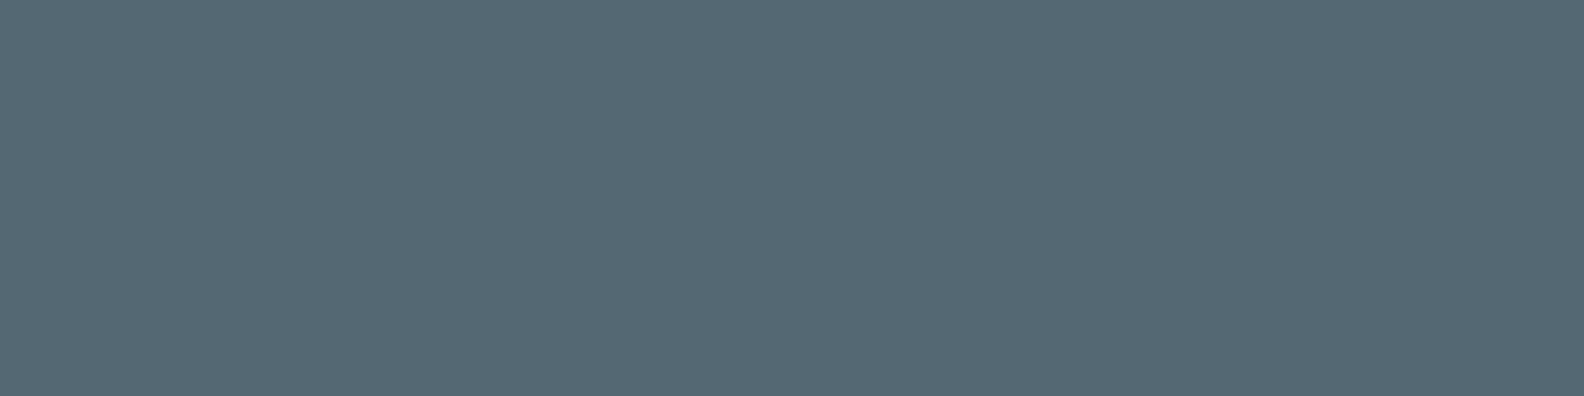 1584x396 Cadet Solid Color Background